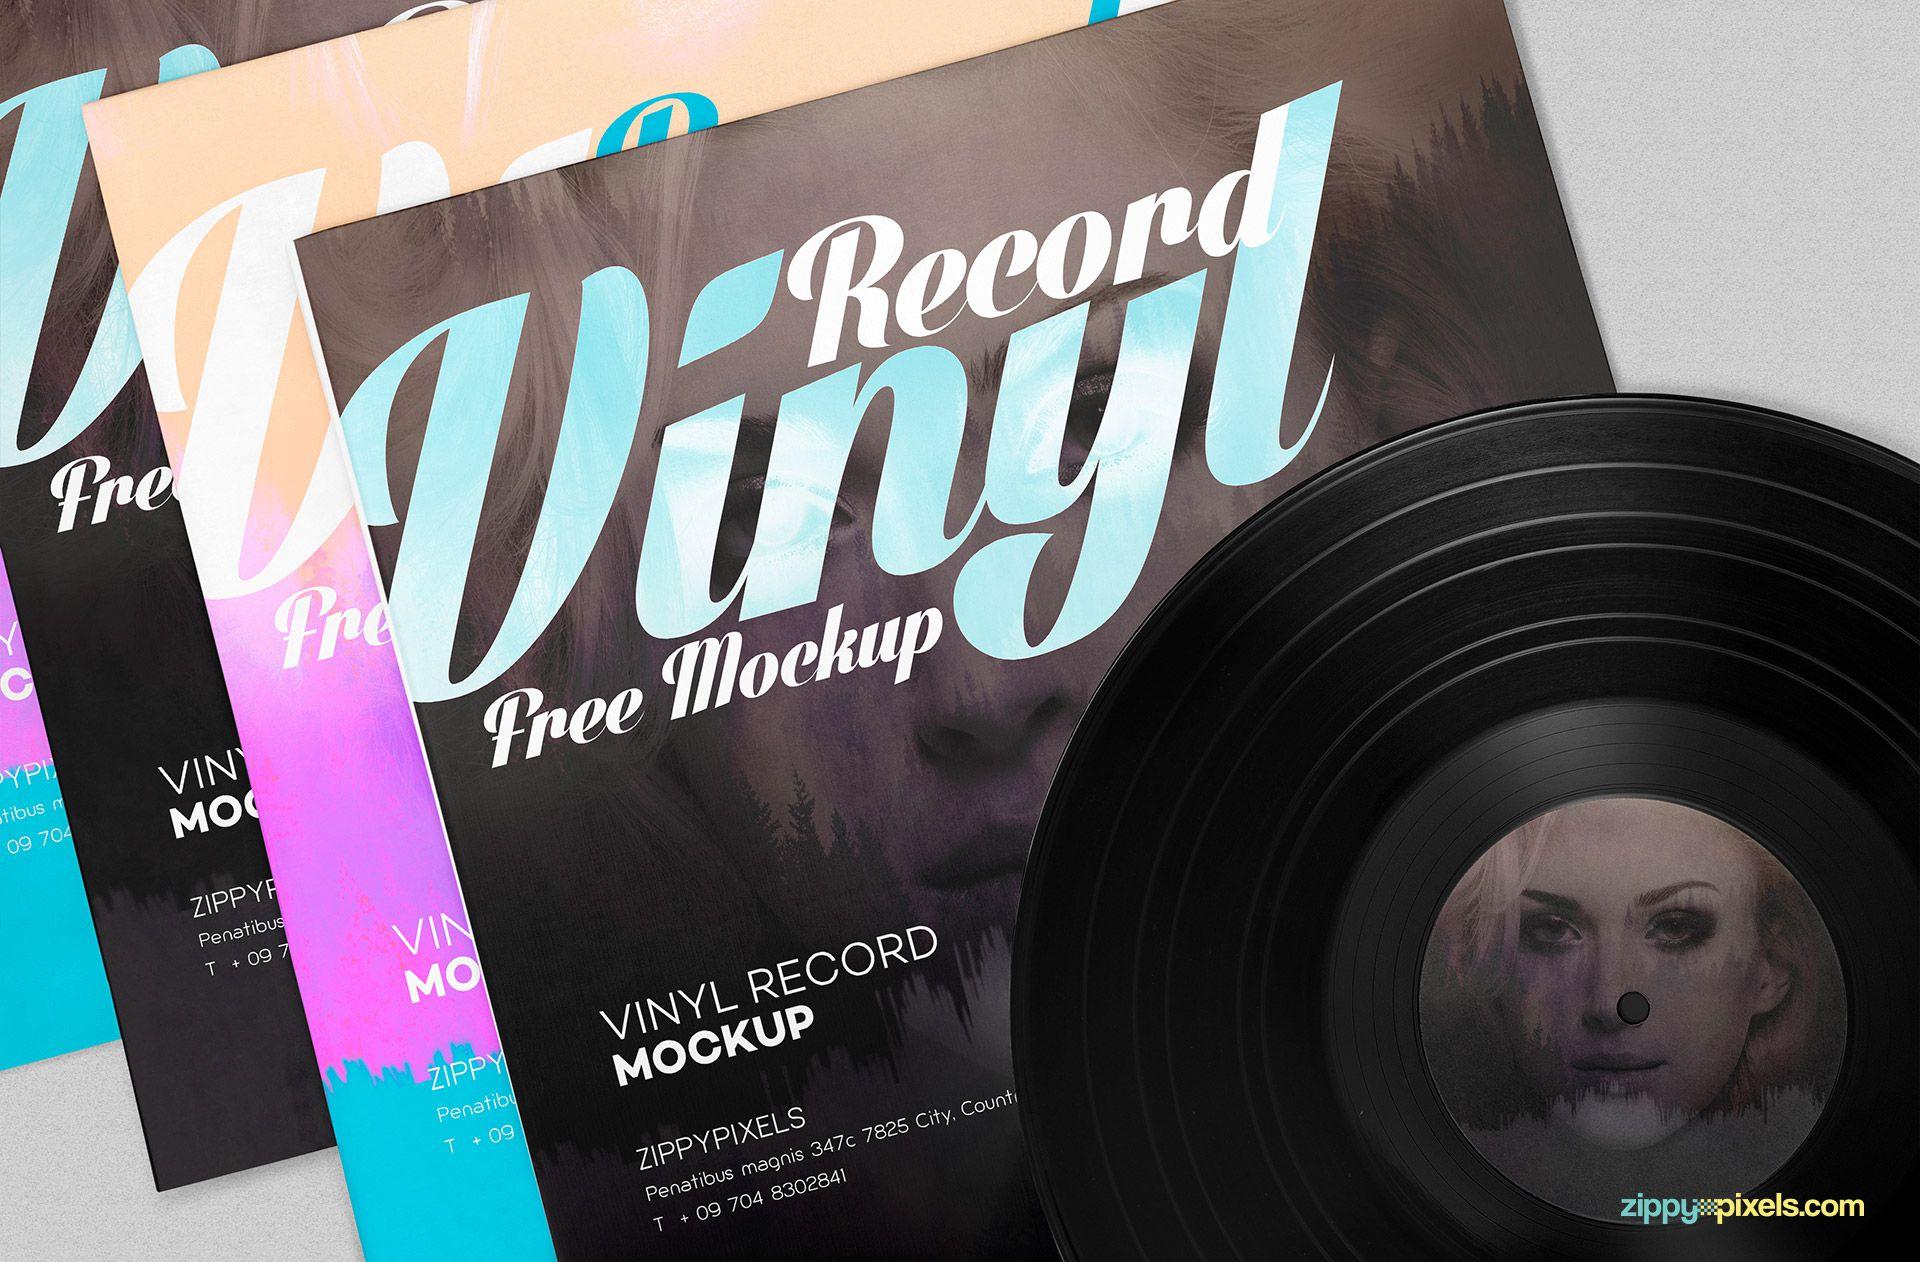 Free record album mockup.